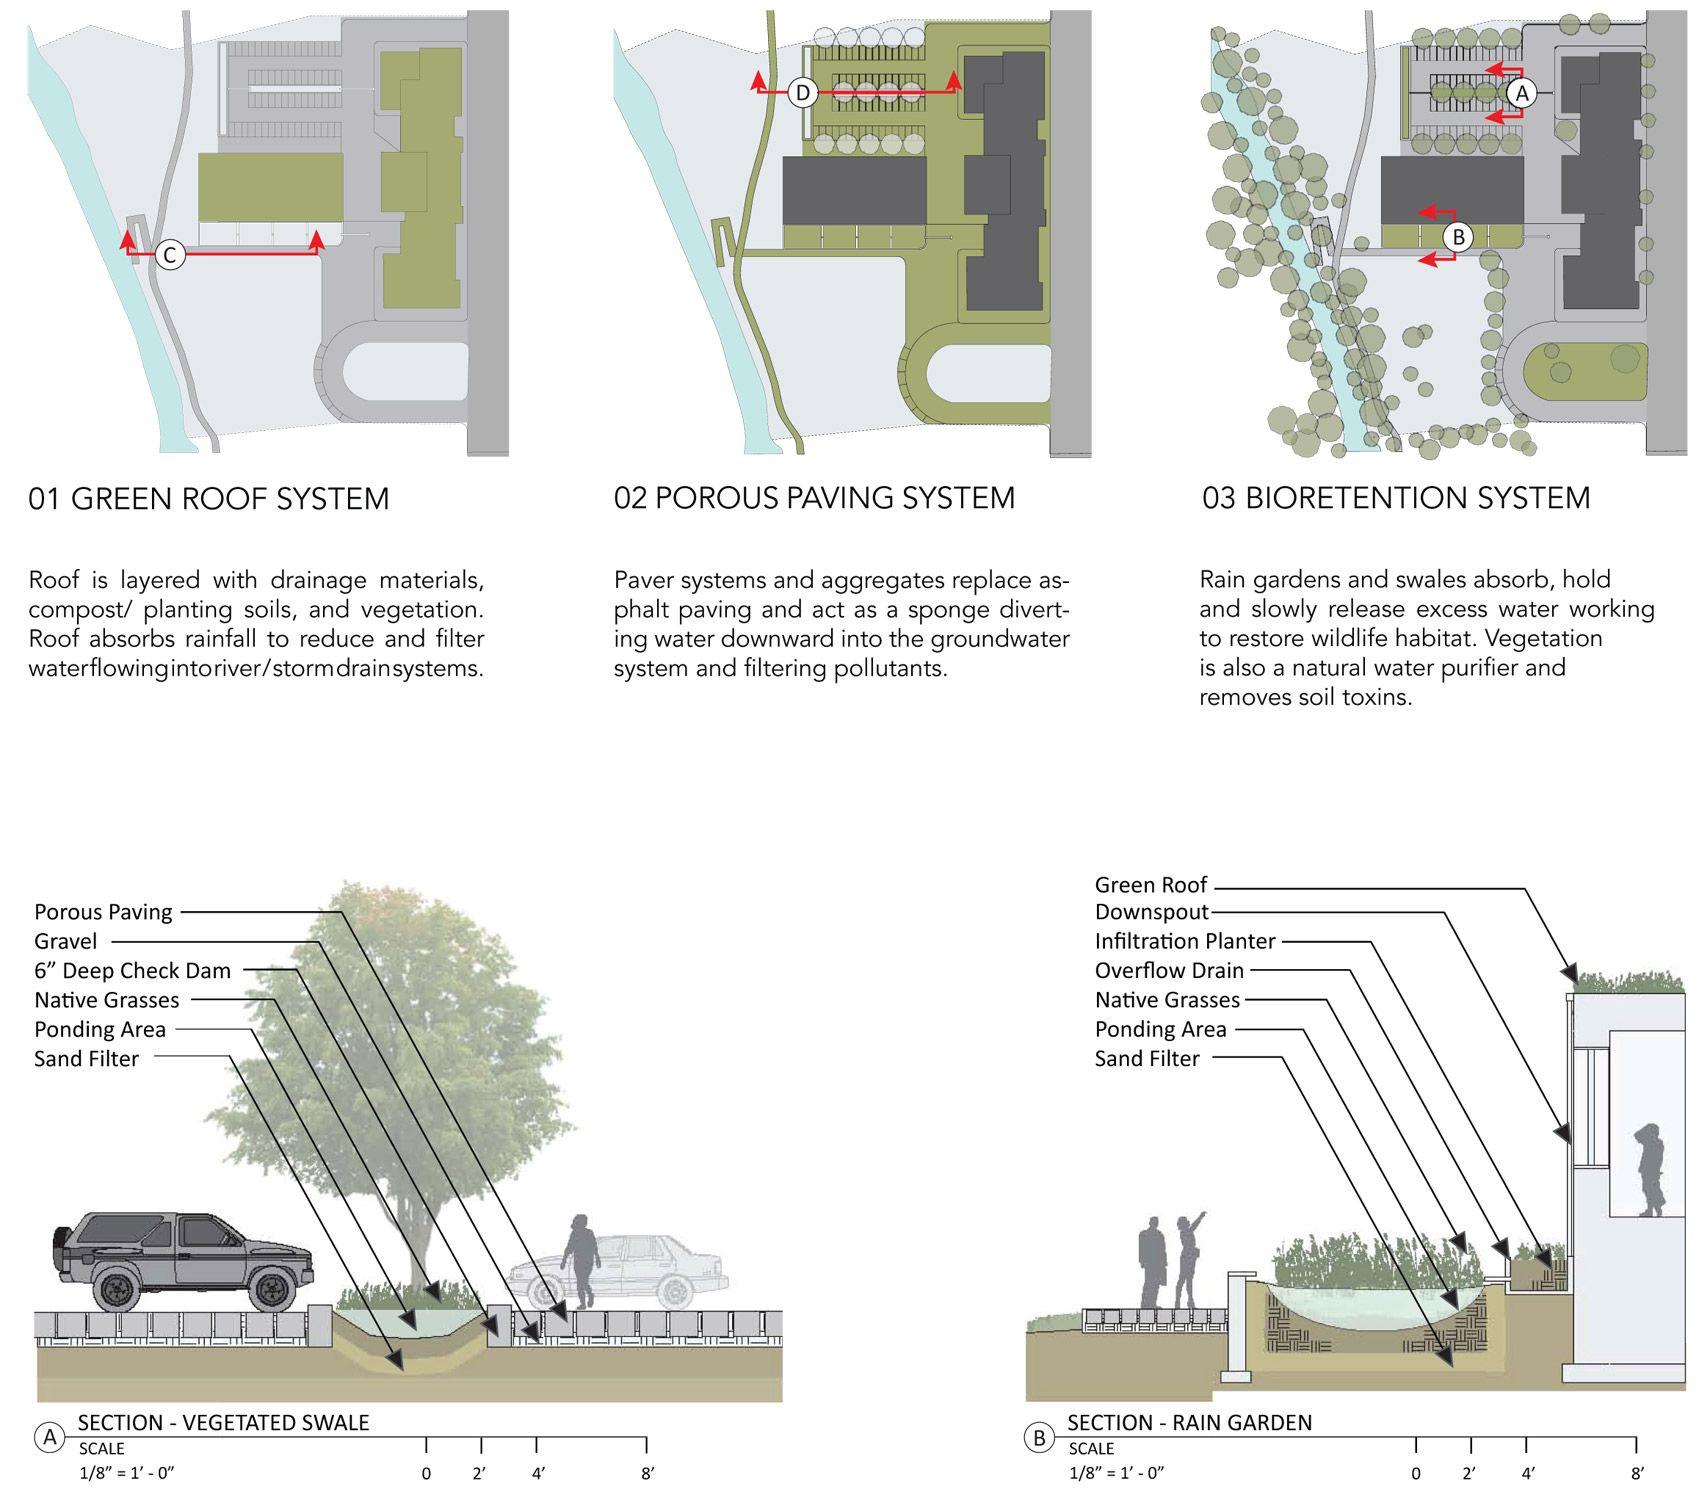 Stormwater Management Design : Stormwater management google search urban hydrology